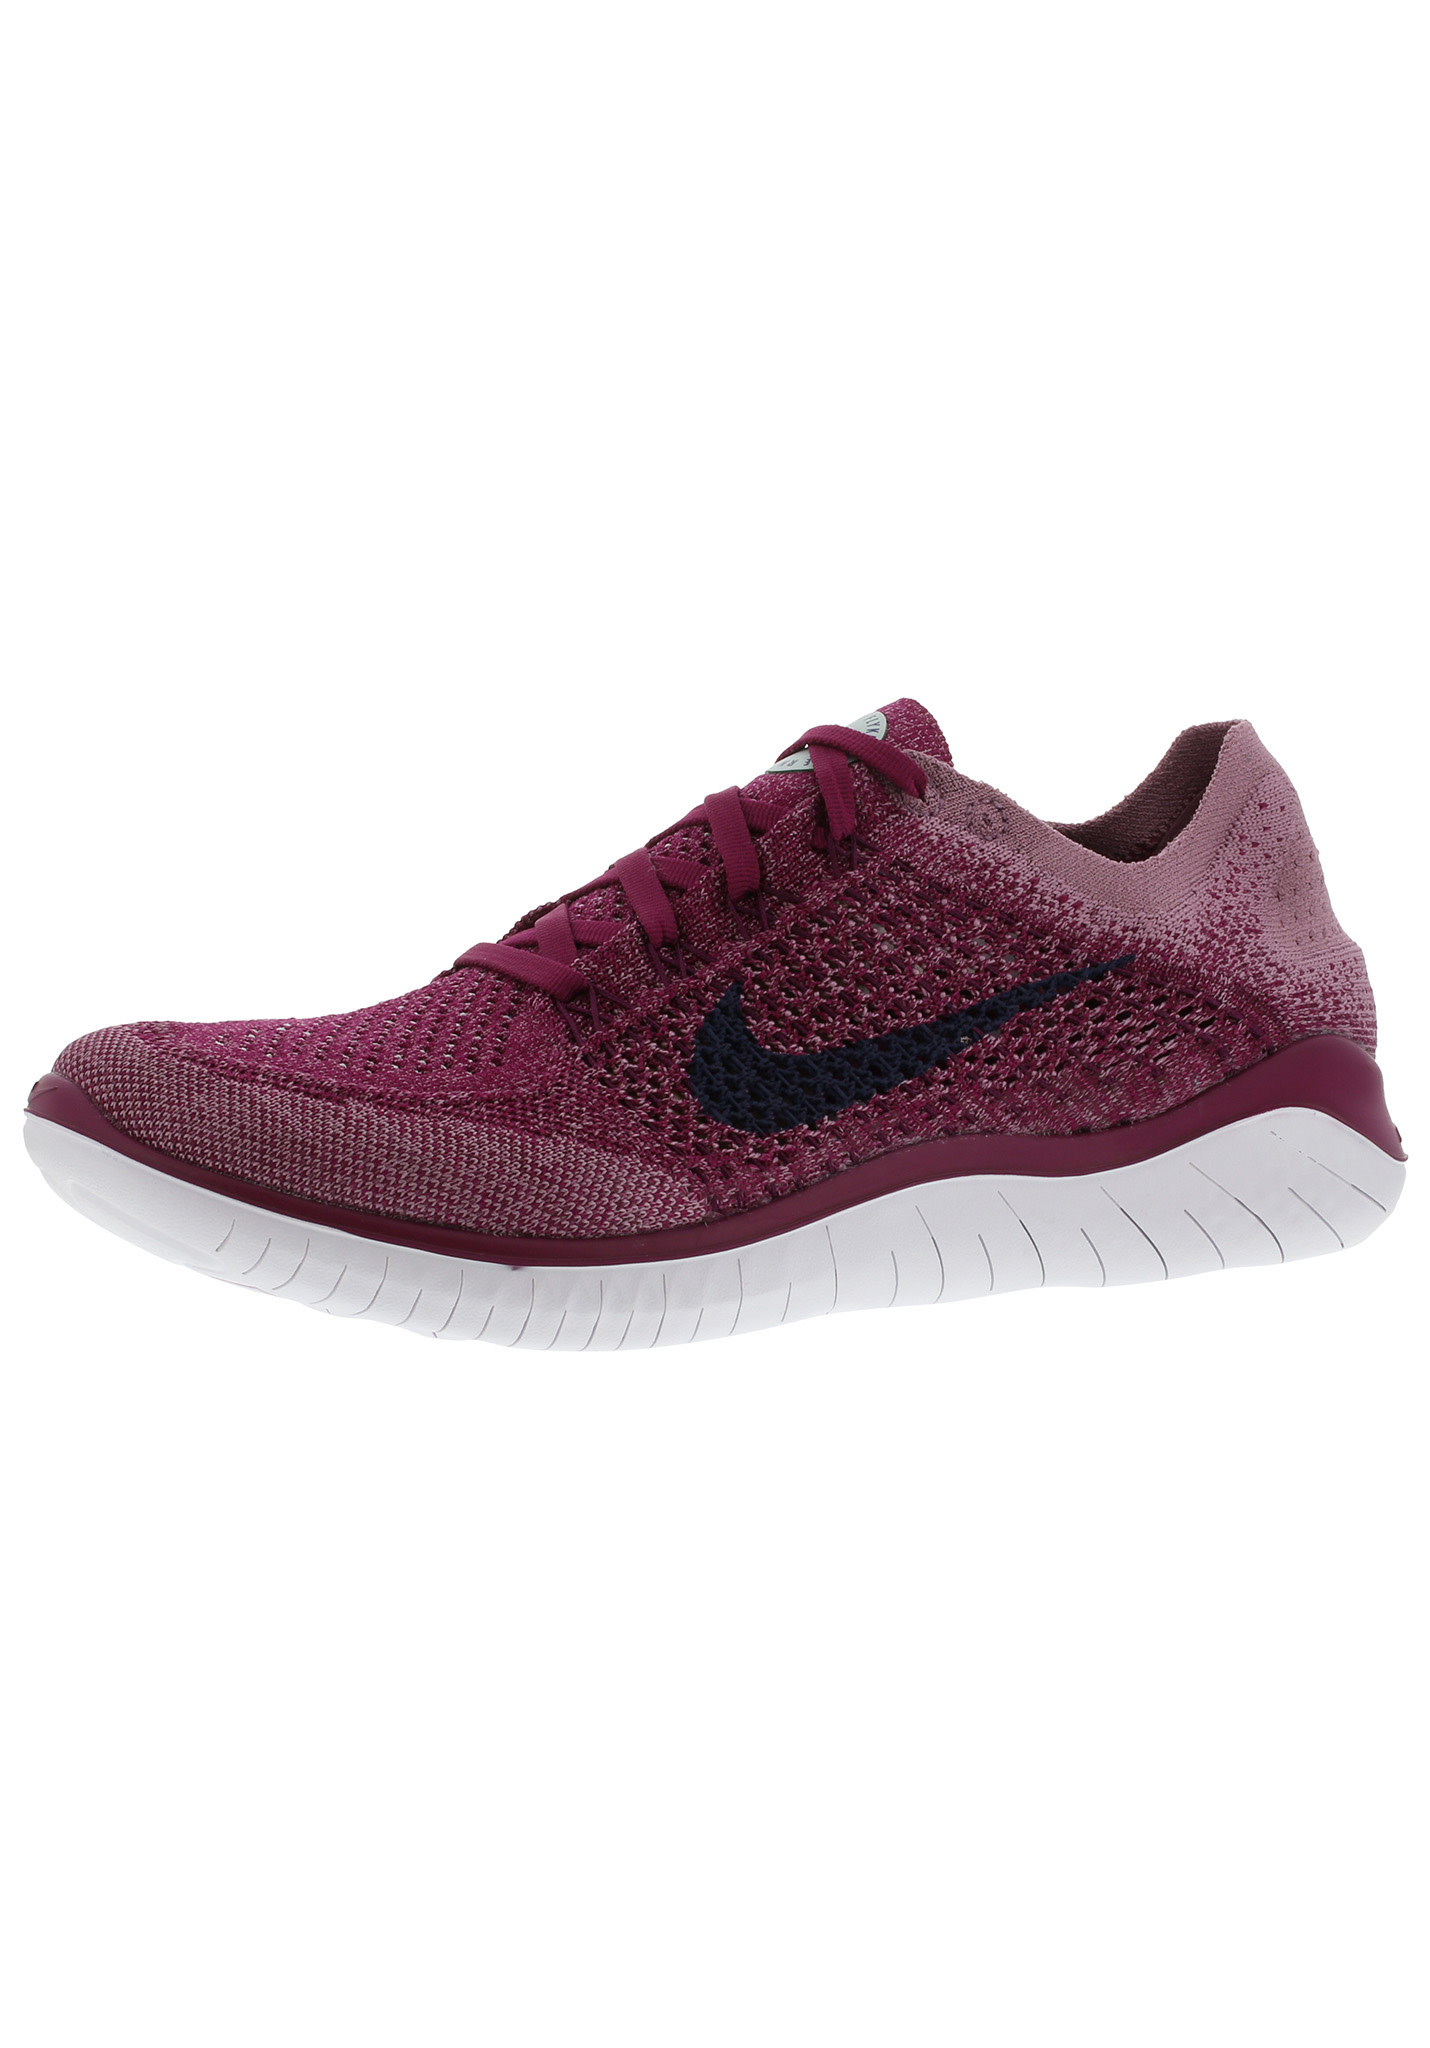 Nike Free RN Flyknit 2018 - Laufschuhe für Damen - Pink | 21RUN